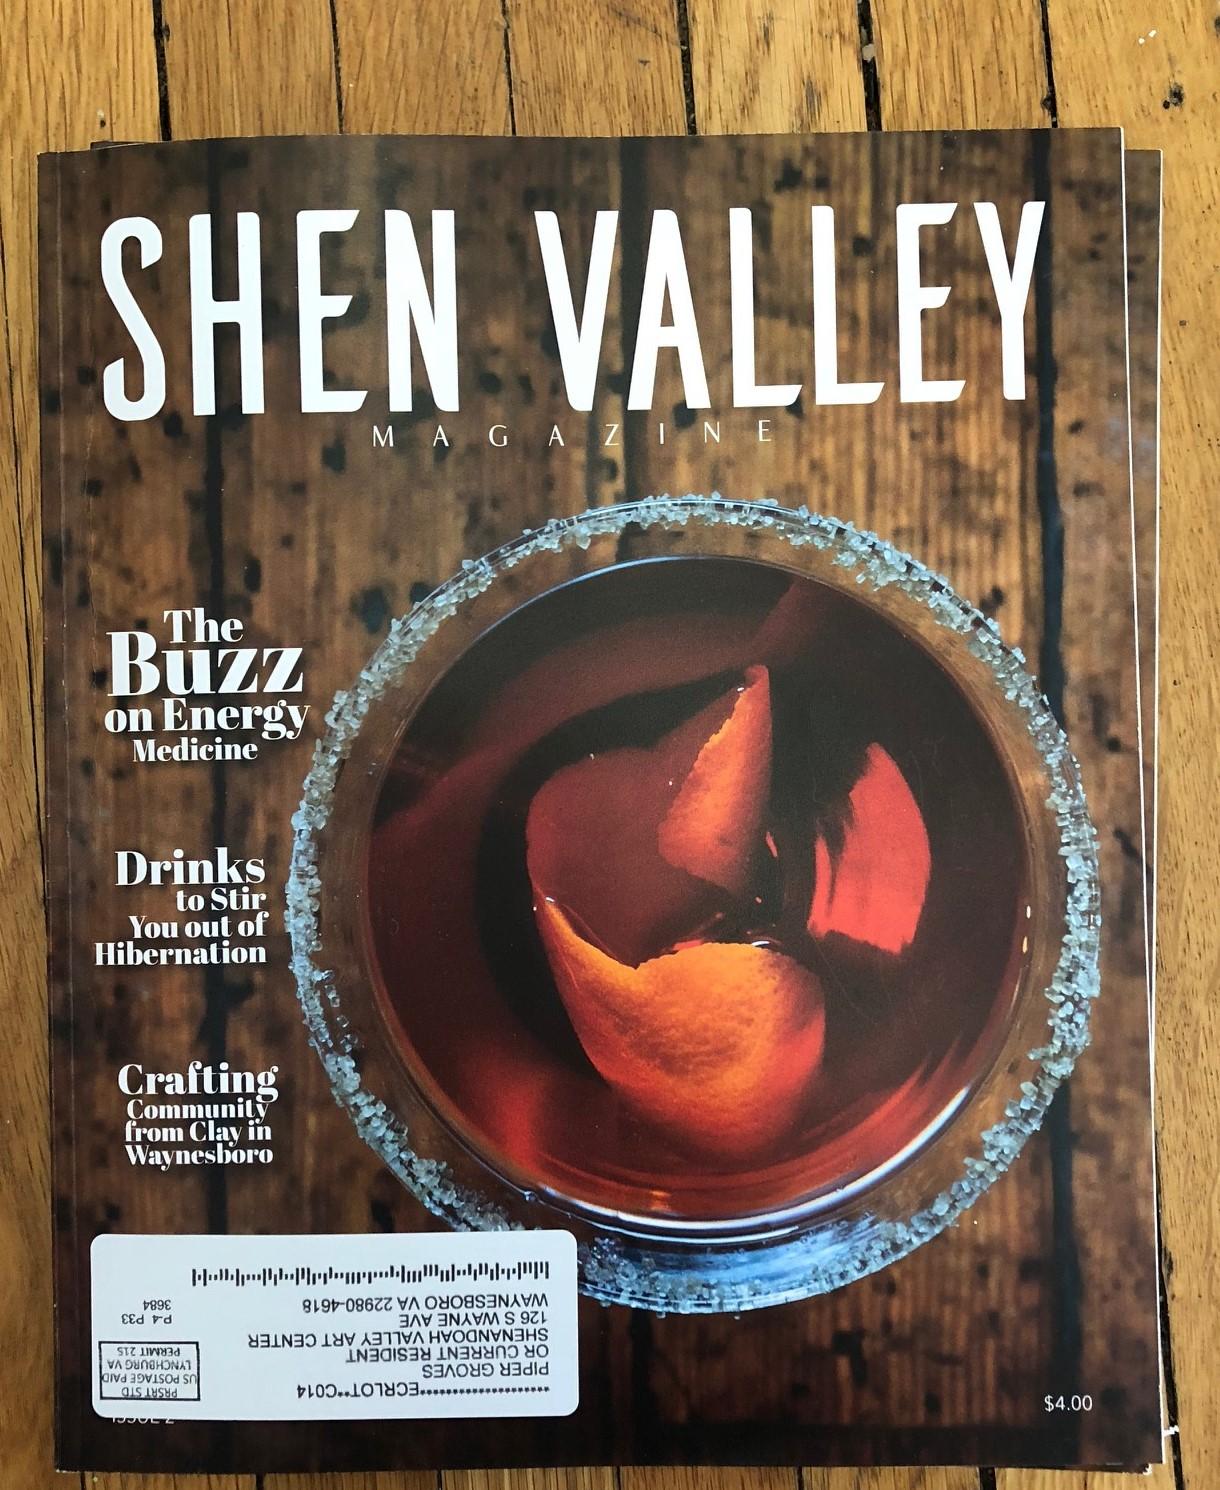 ShenValley magazine Cover.jpg